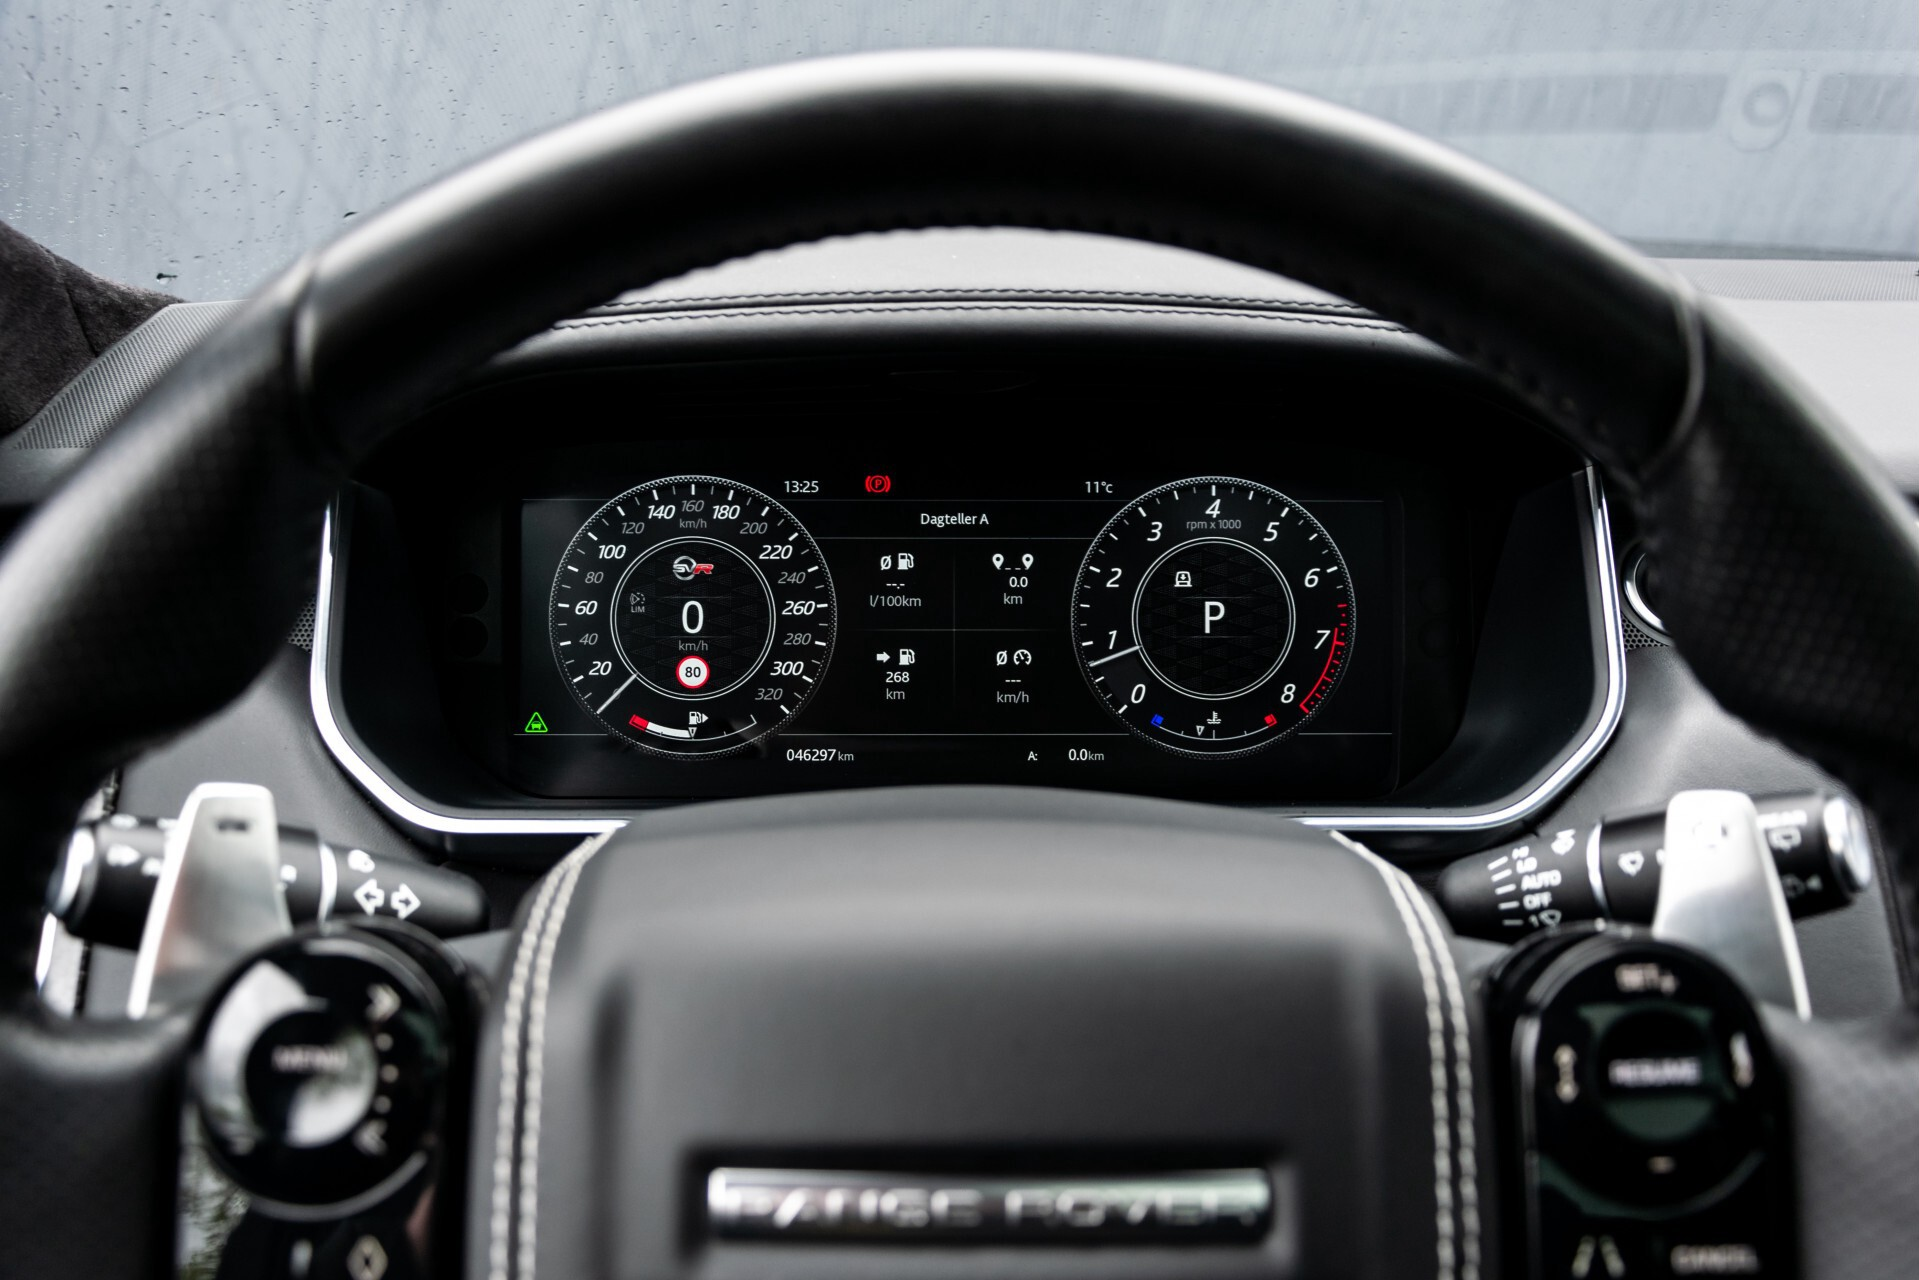 Land Rover Range Rover Sport SVR 5.0 Supercharged 575pk Full Carbon Nieuwprijs €241377 Foto 12